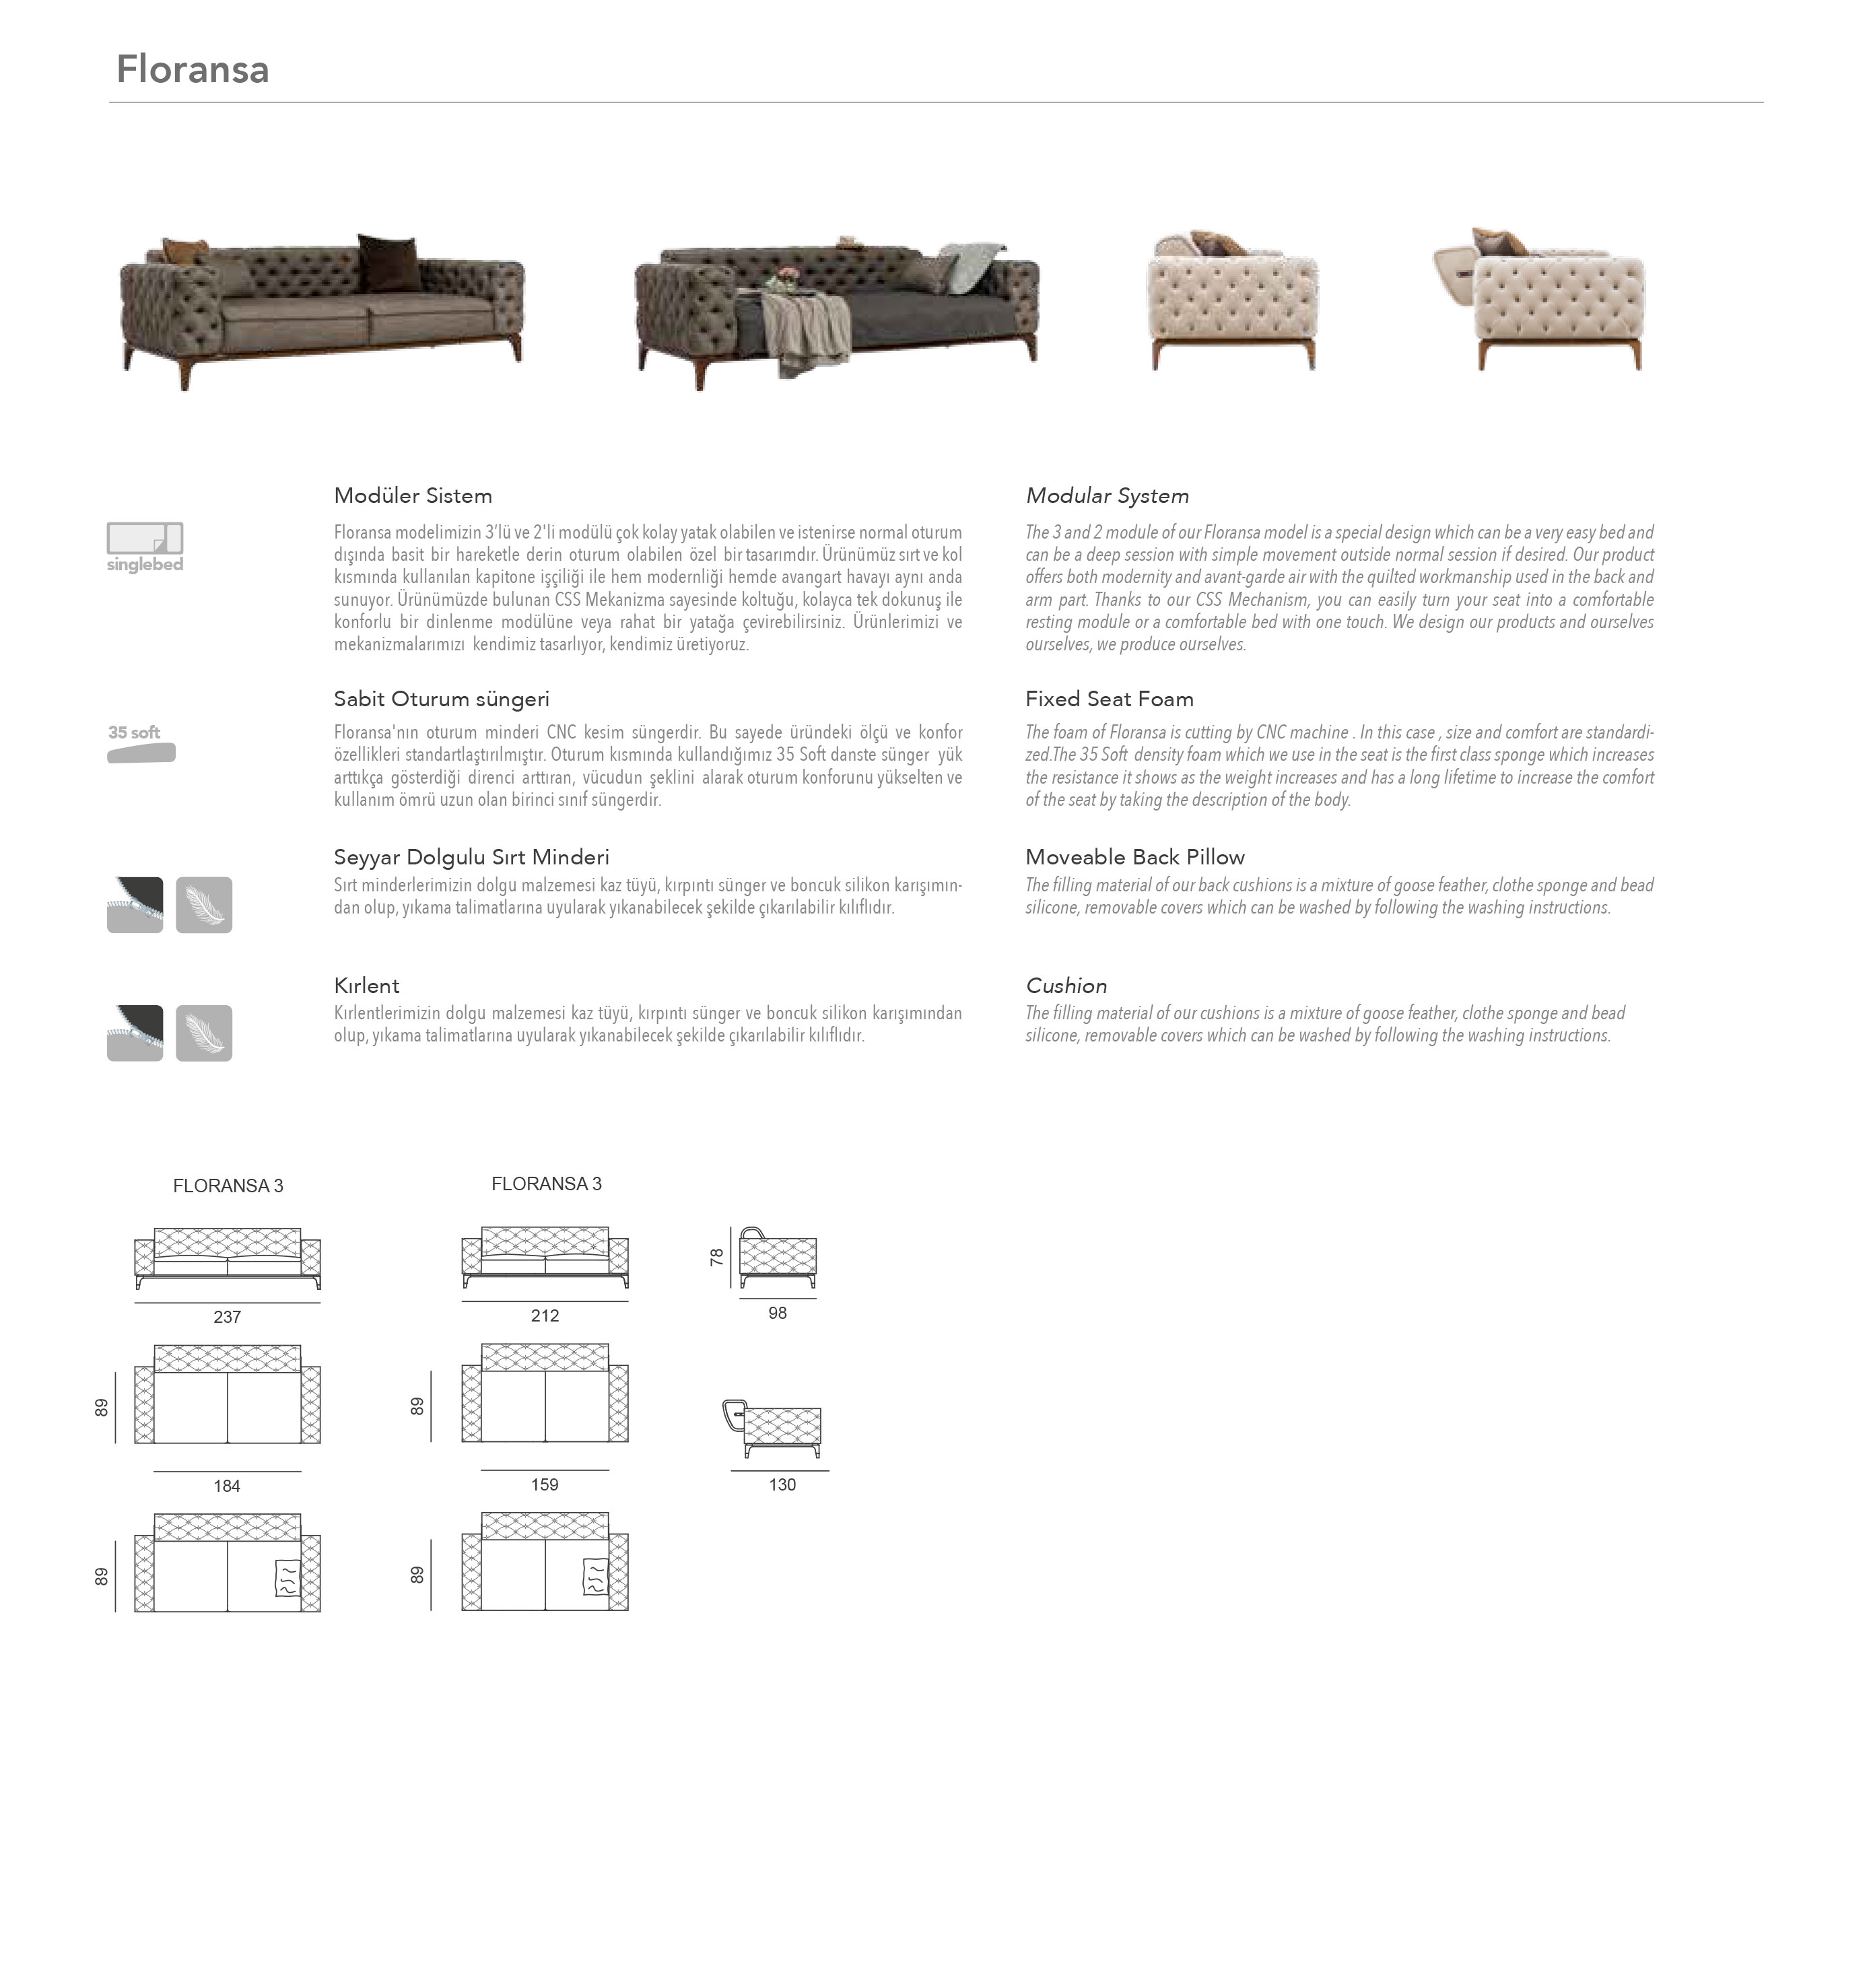 floransa-sofa-set